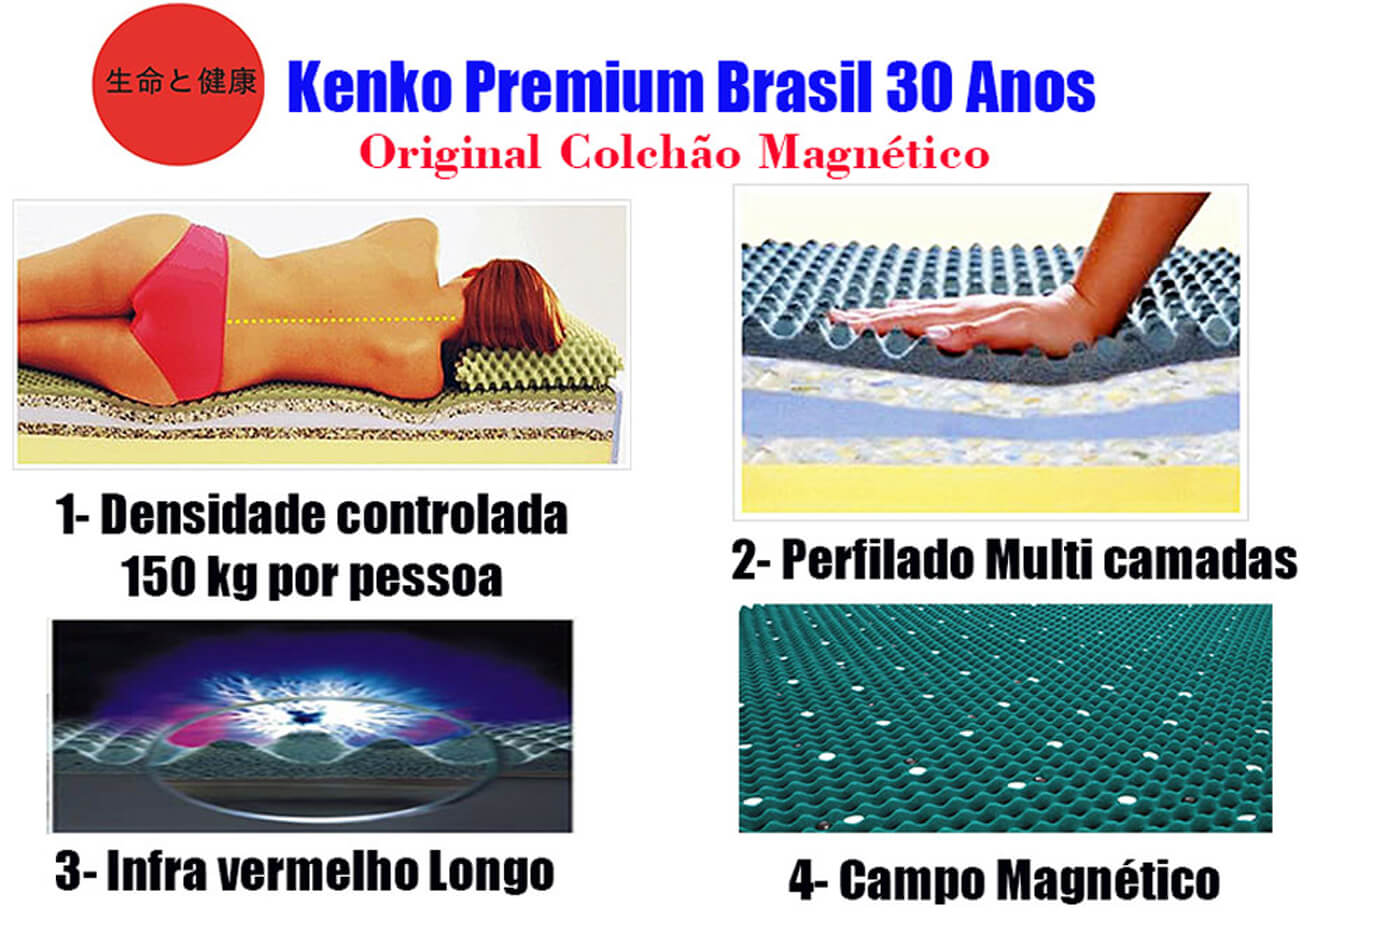 Manta Magnética Colchonete Kenko Premium 5cm Altura  - Kenko Premium Colchões